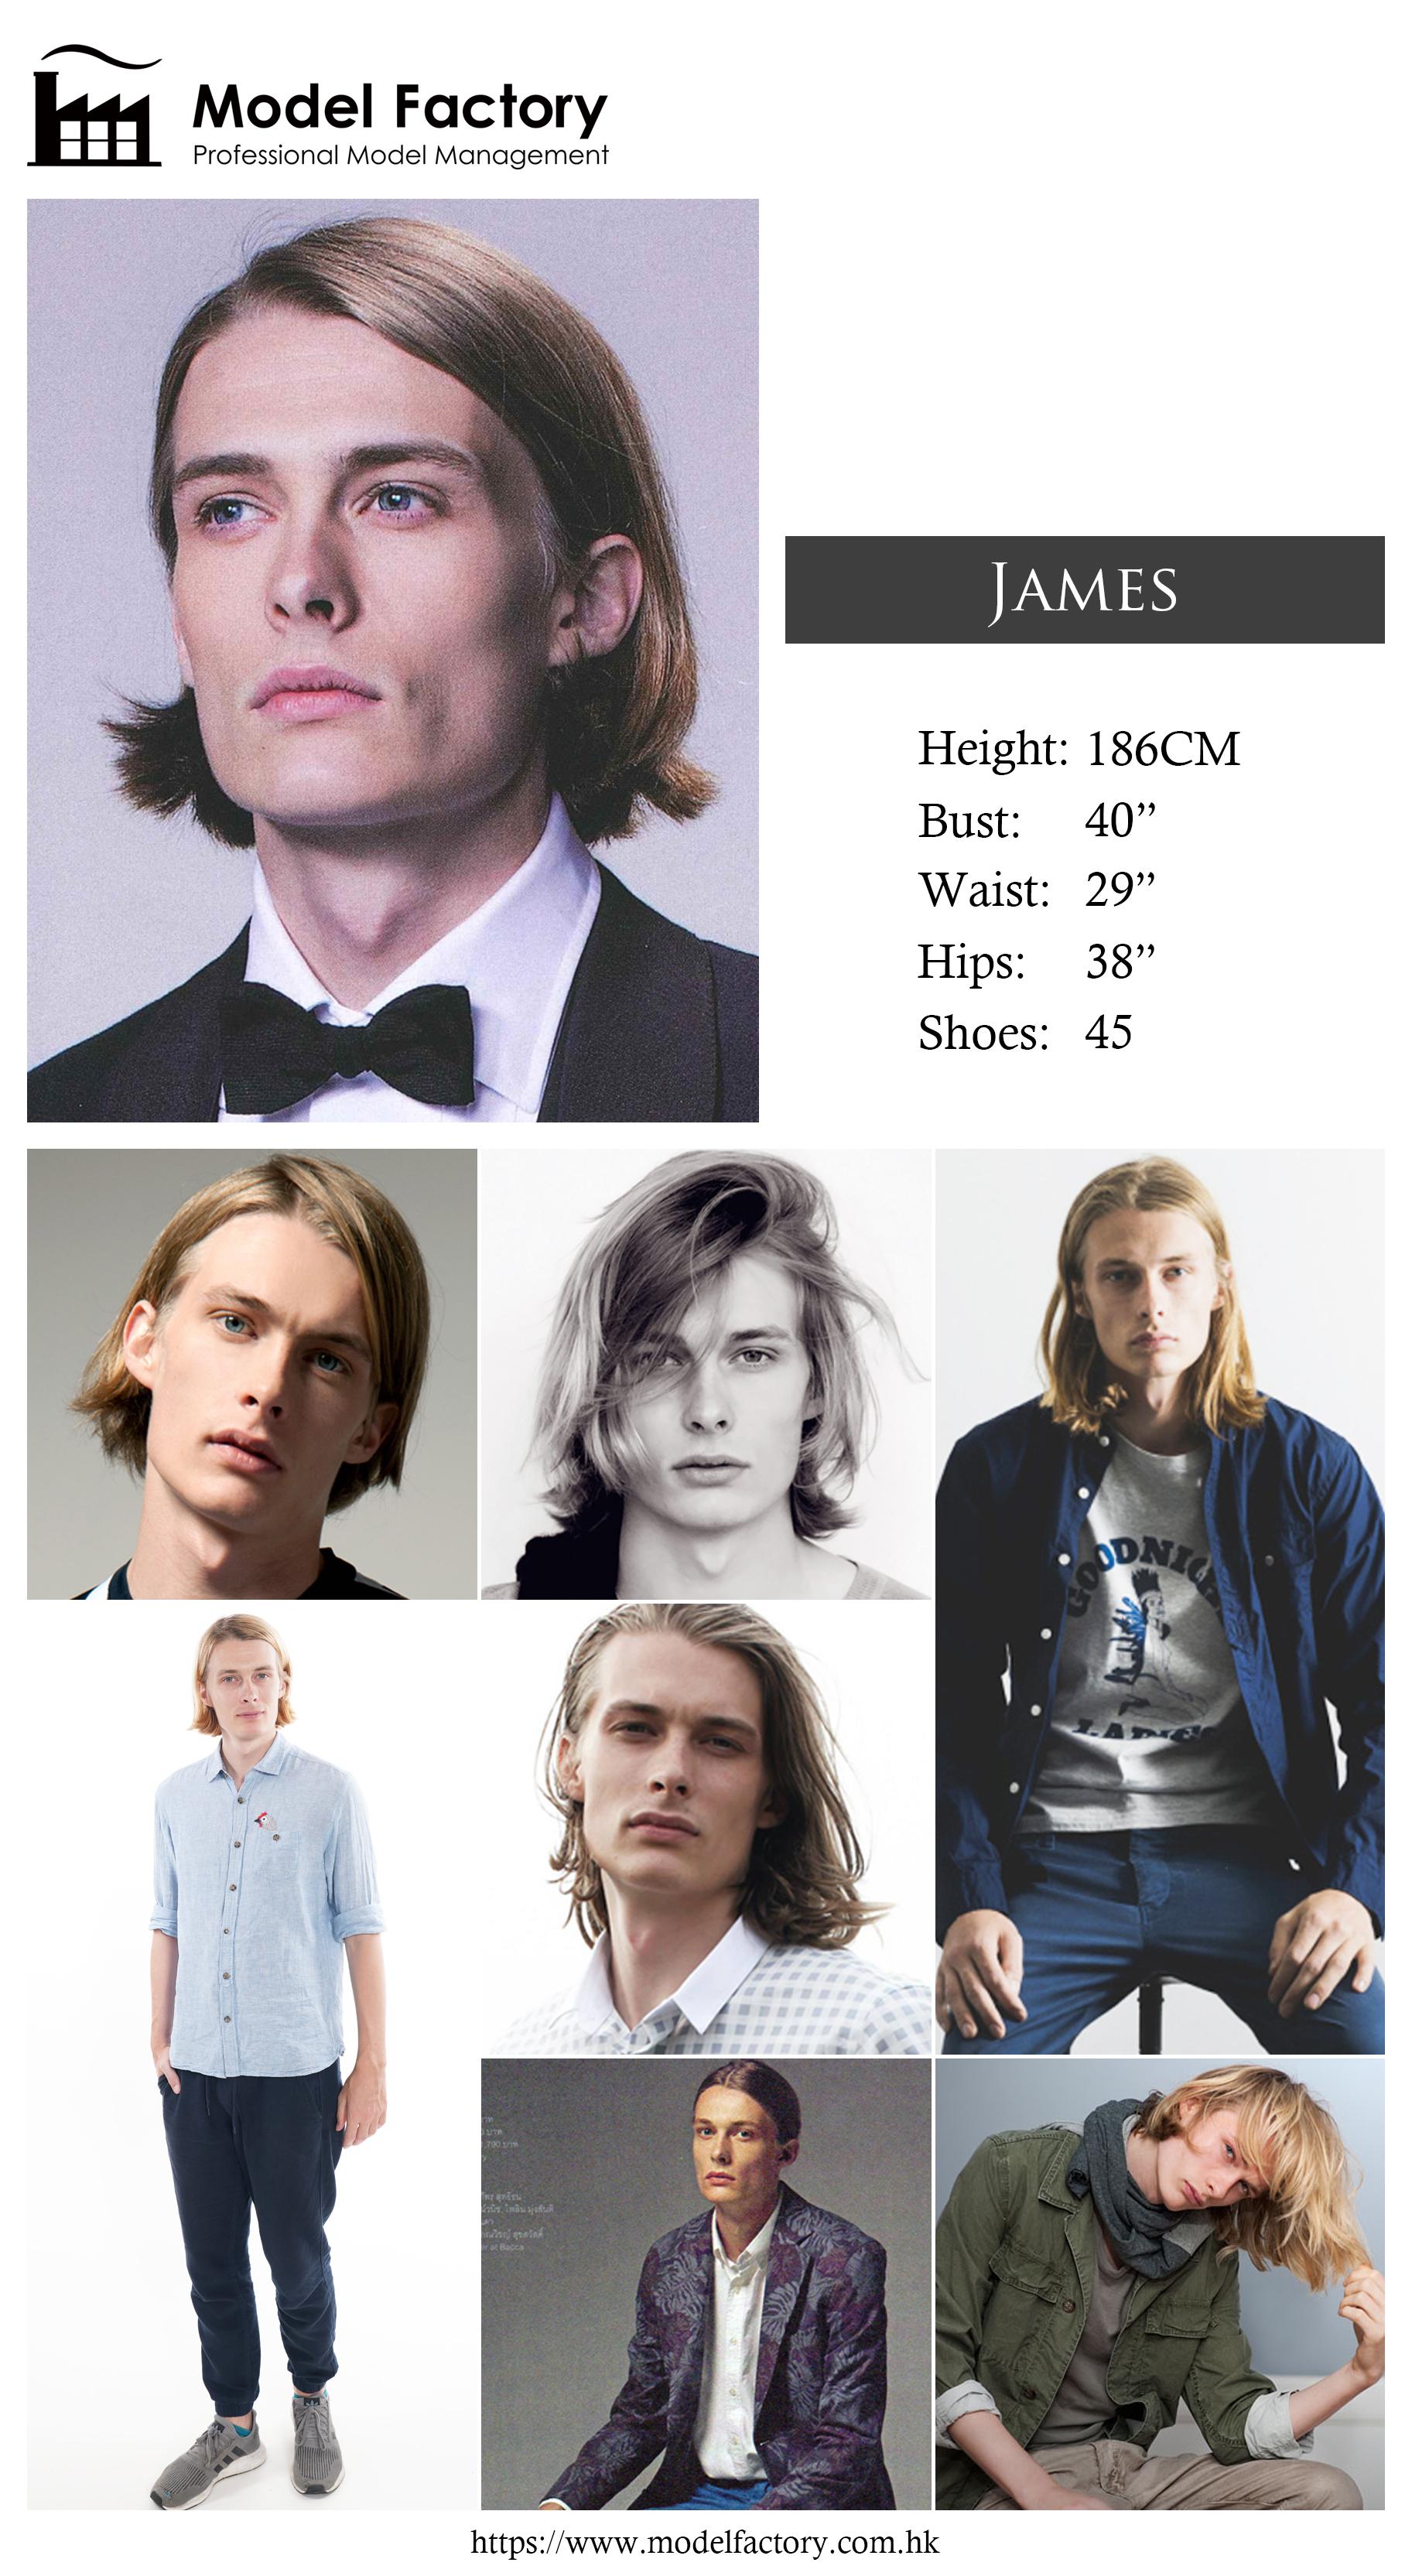 Model Factory Caucasian Male Model James